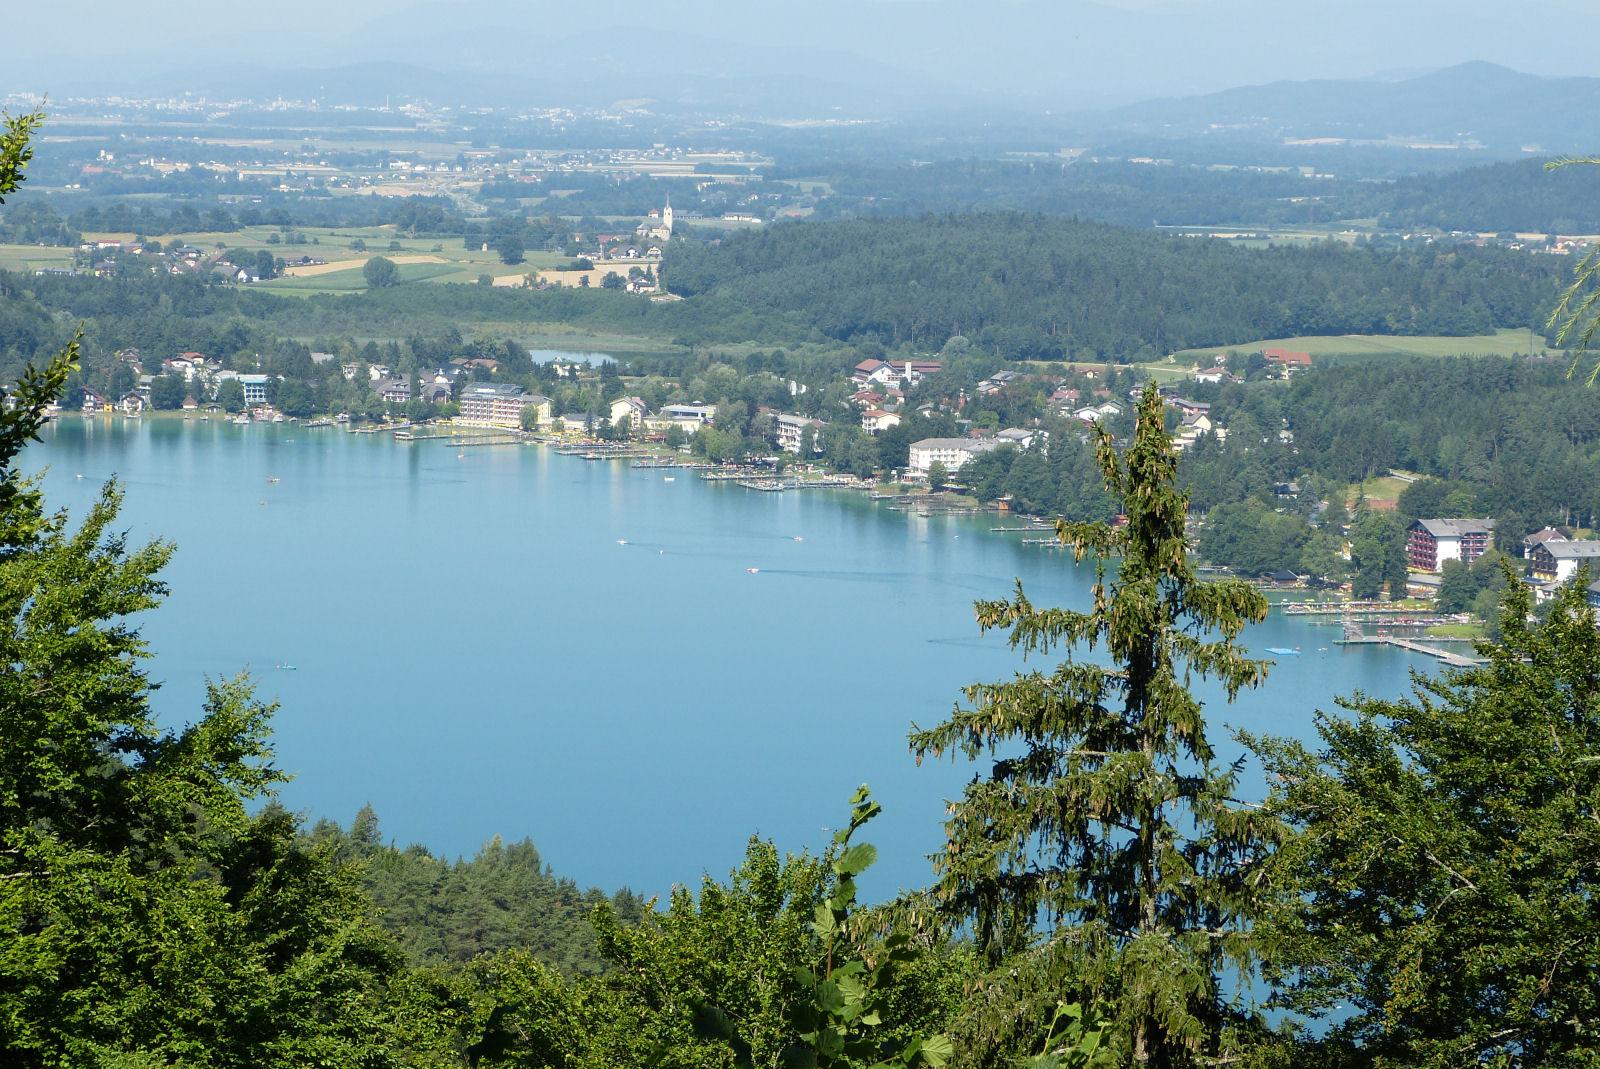 Lake Klopein or Klopeiner see in Carinthia, Austria